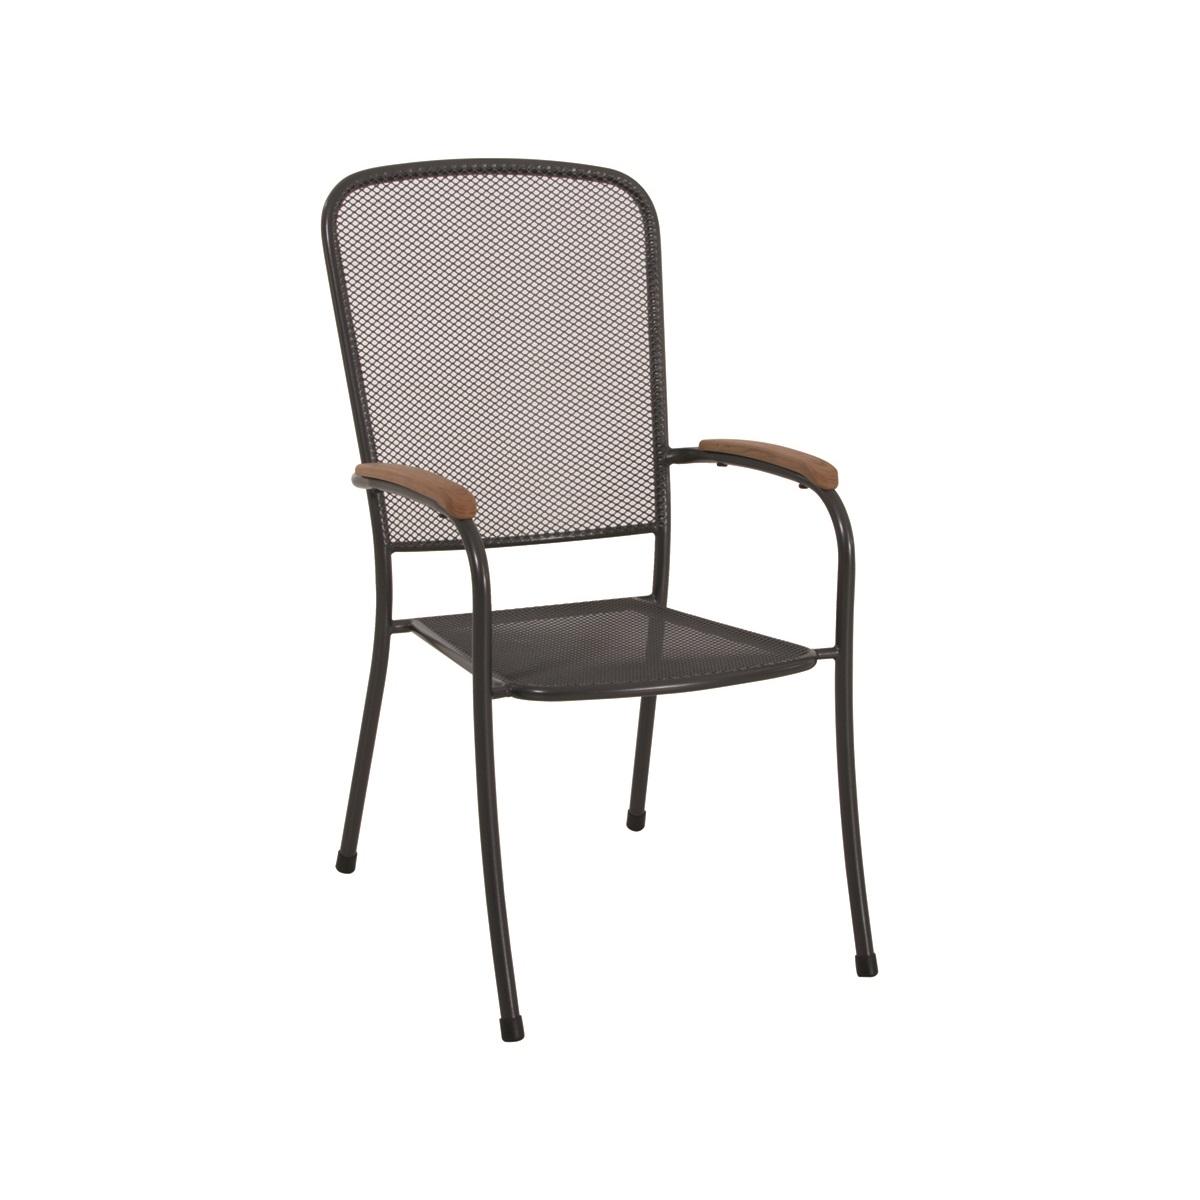 stohovatelná židle z tahokovu 66,5 x 54,5 x 98,5 cm MWH Mesona